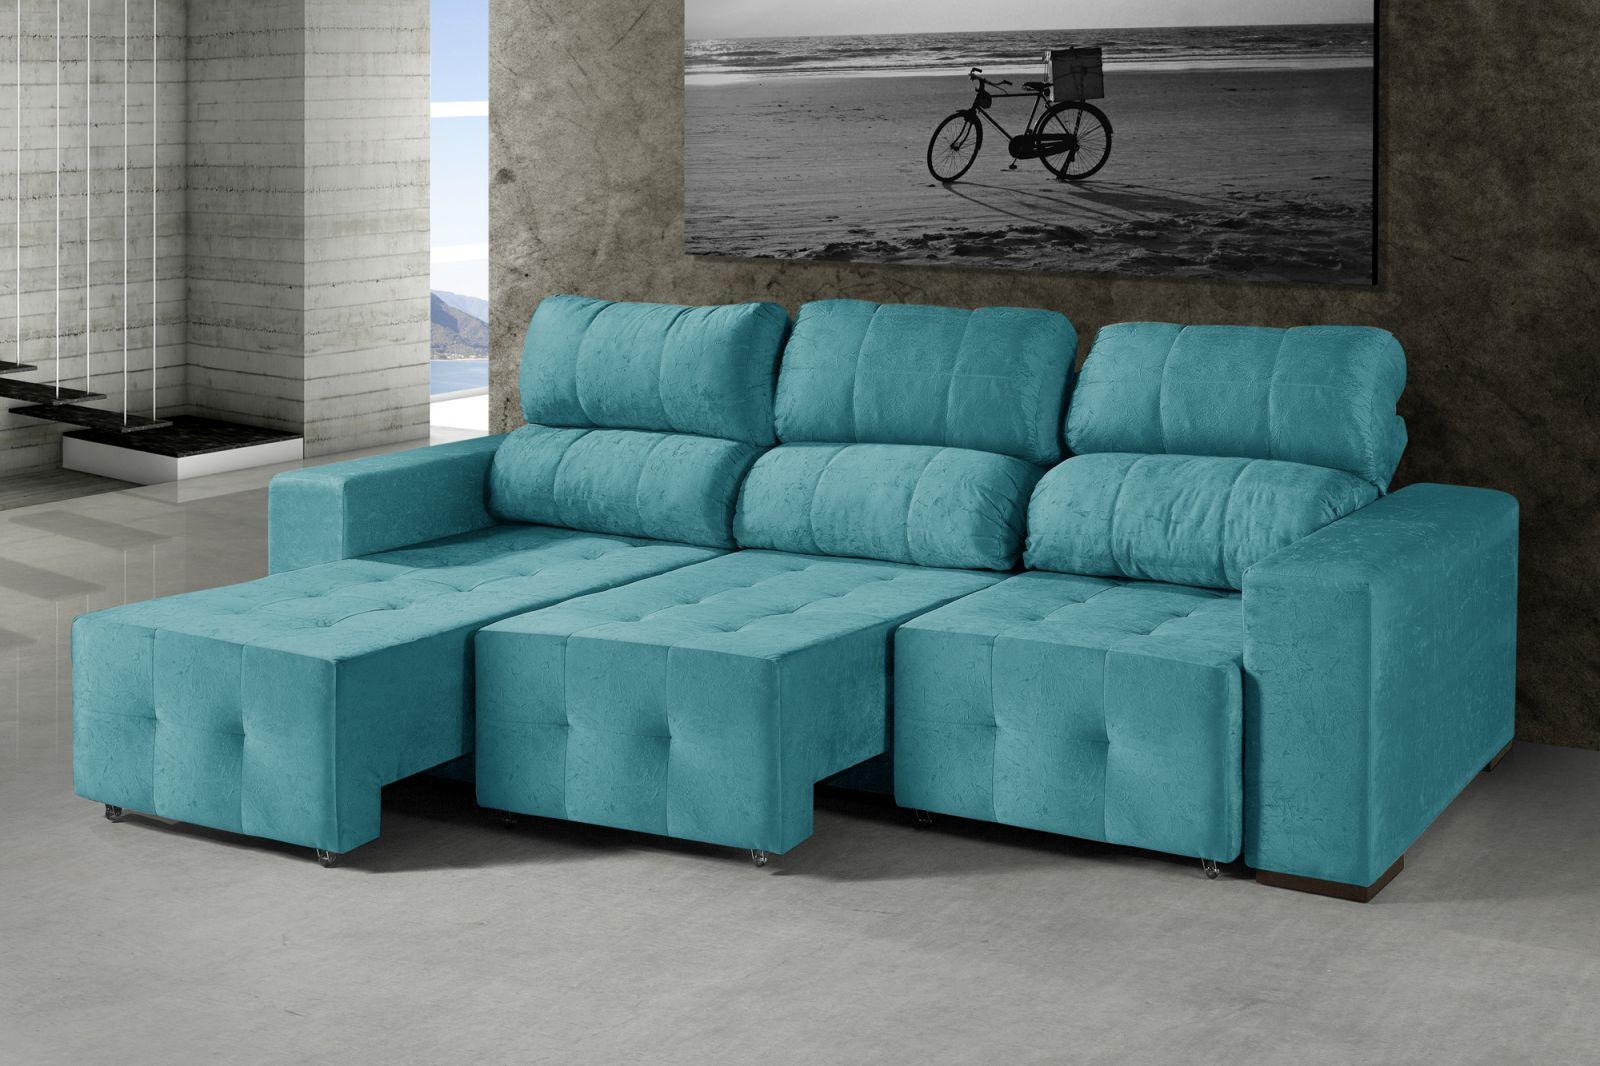 Sofa azul turquesa idea de la imagen de inicio for Chaise longue azul turquesa